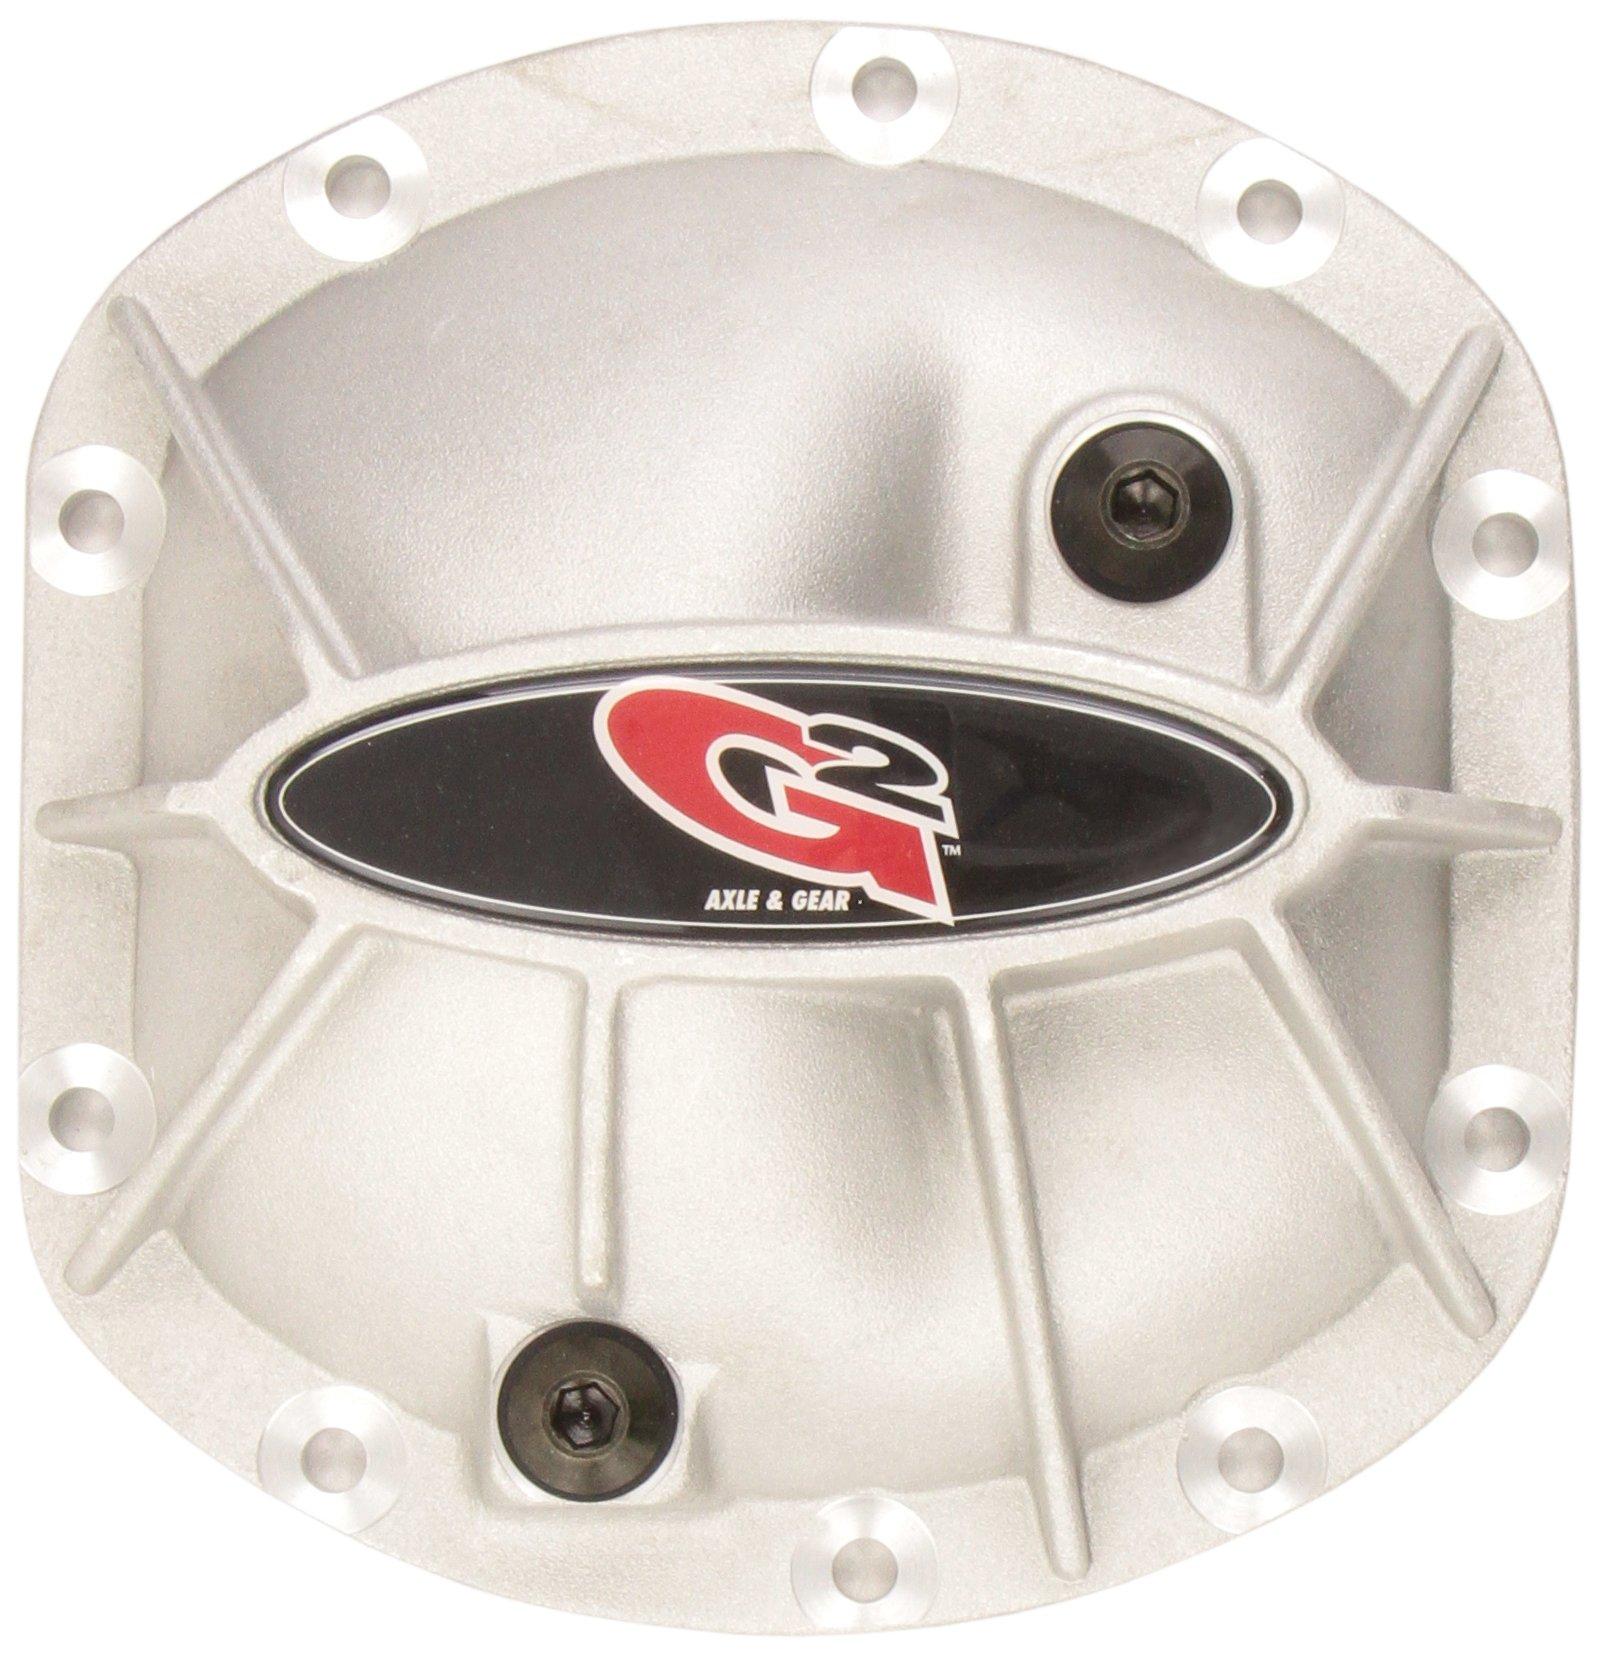 G2 Axle & Gear 40-2031AL G-2 Aliminum Differential Cover